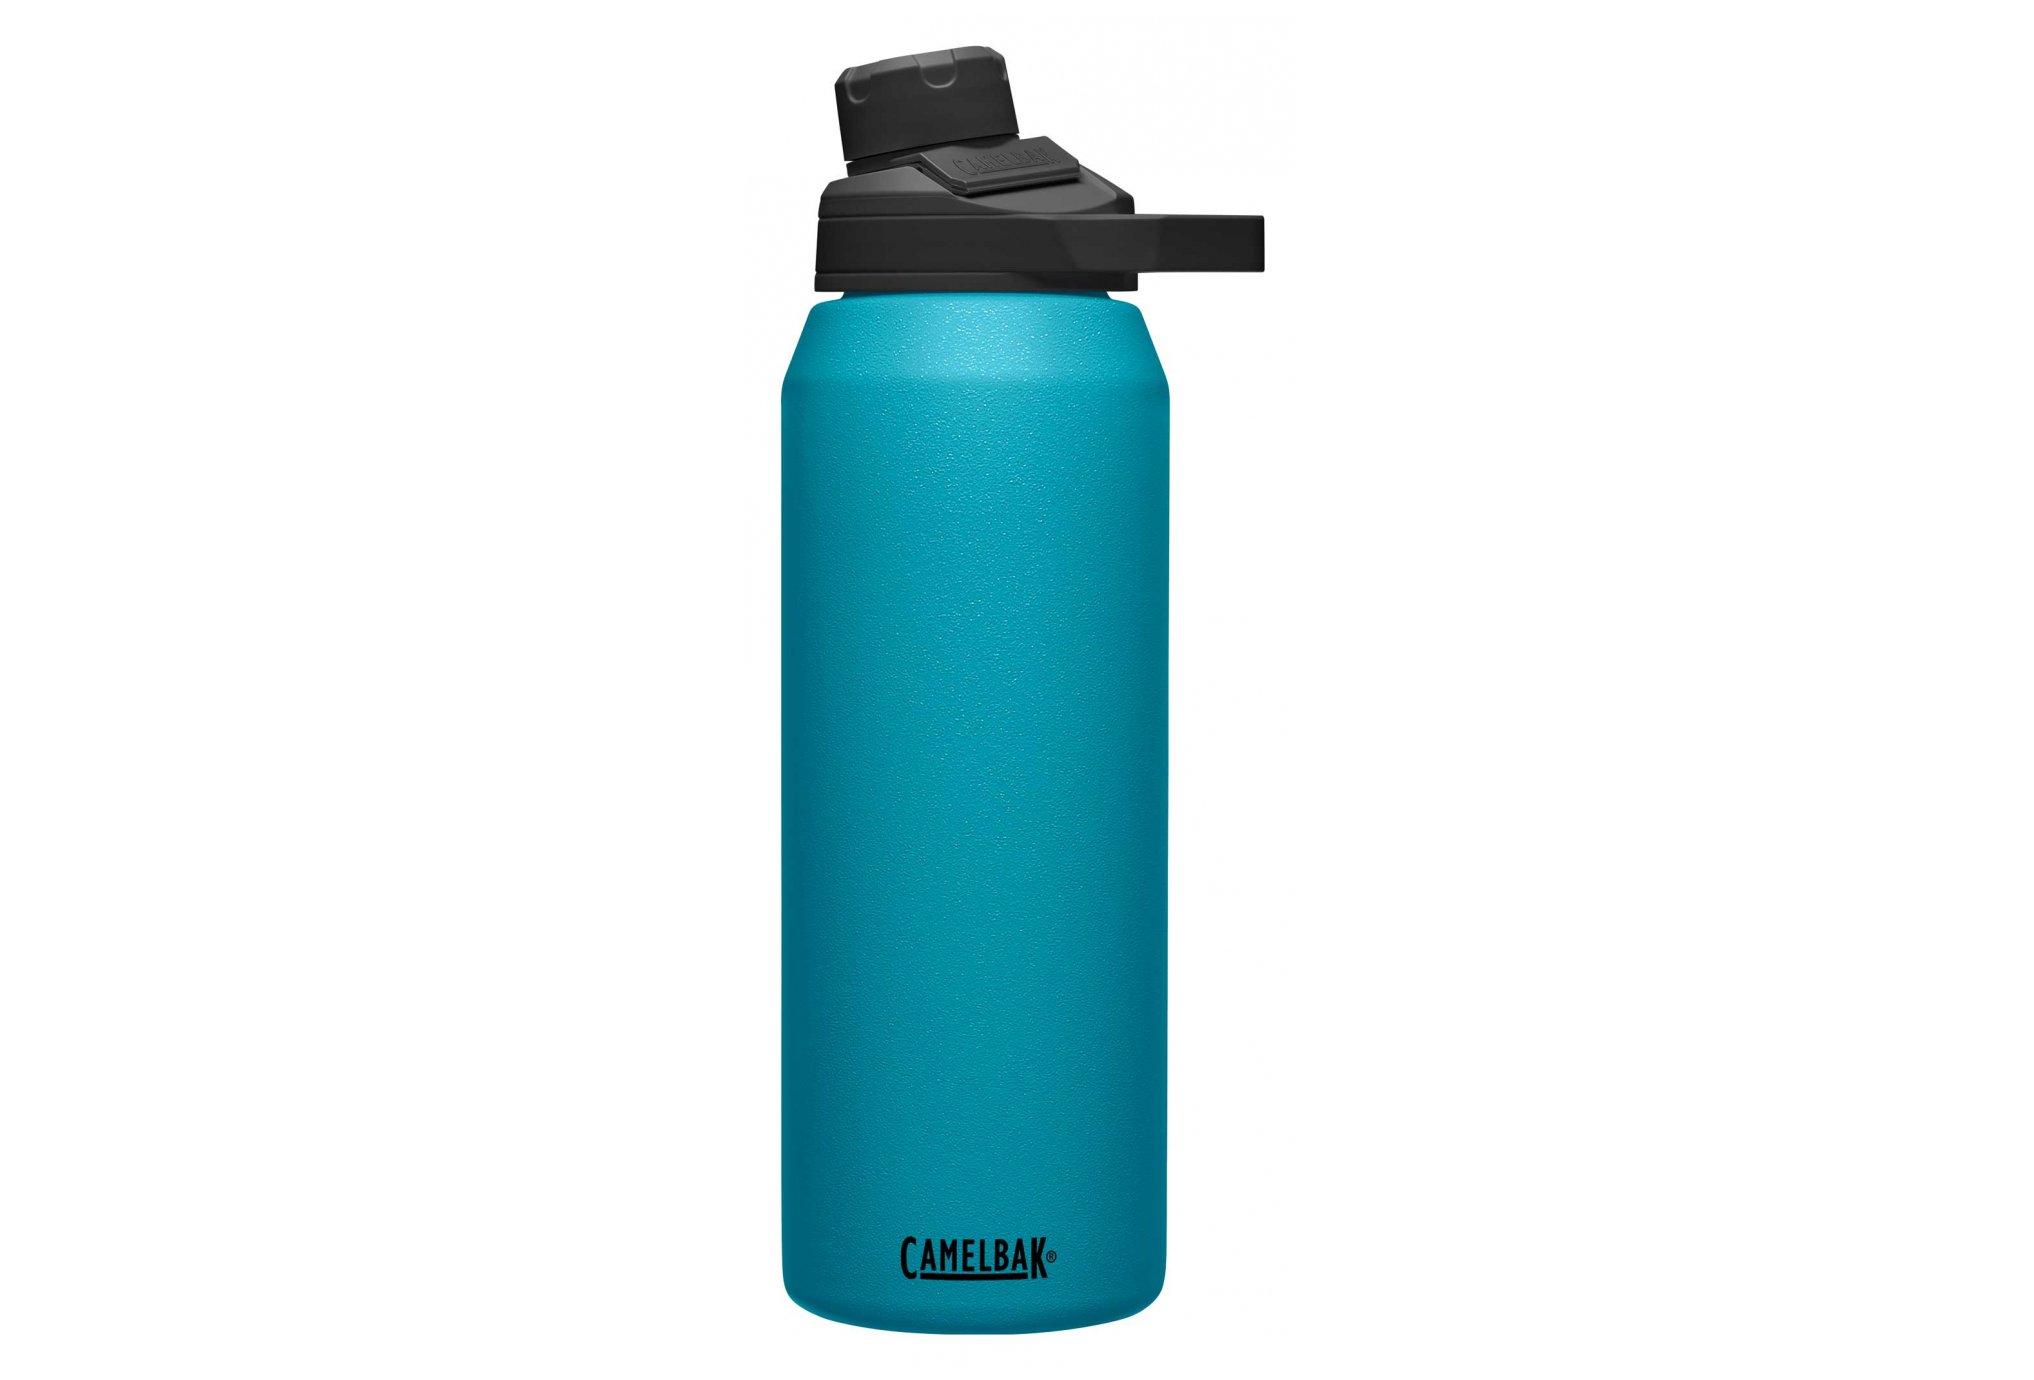 Camelbak Chute Mag SST Vacuum Insulated 1L Sac hydratation / Gourde